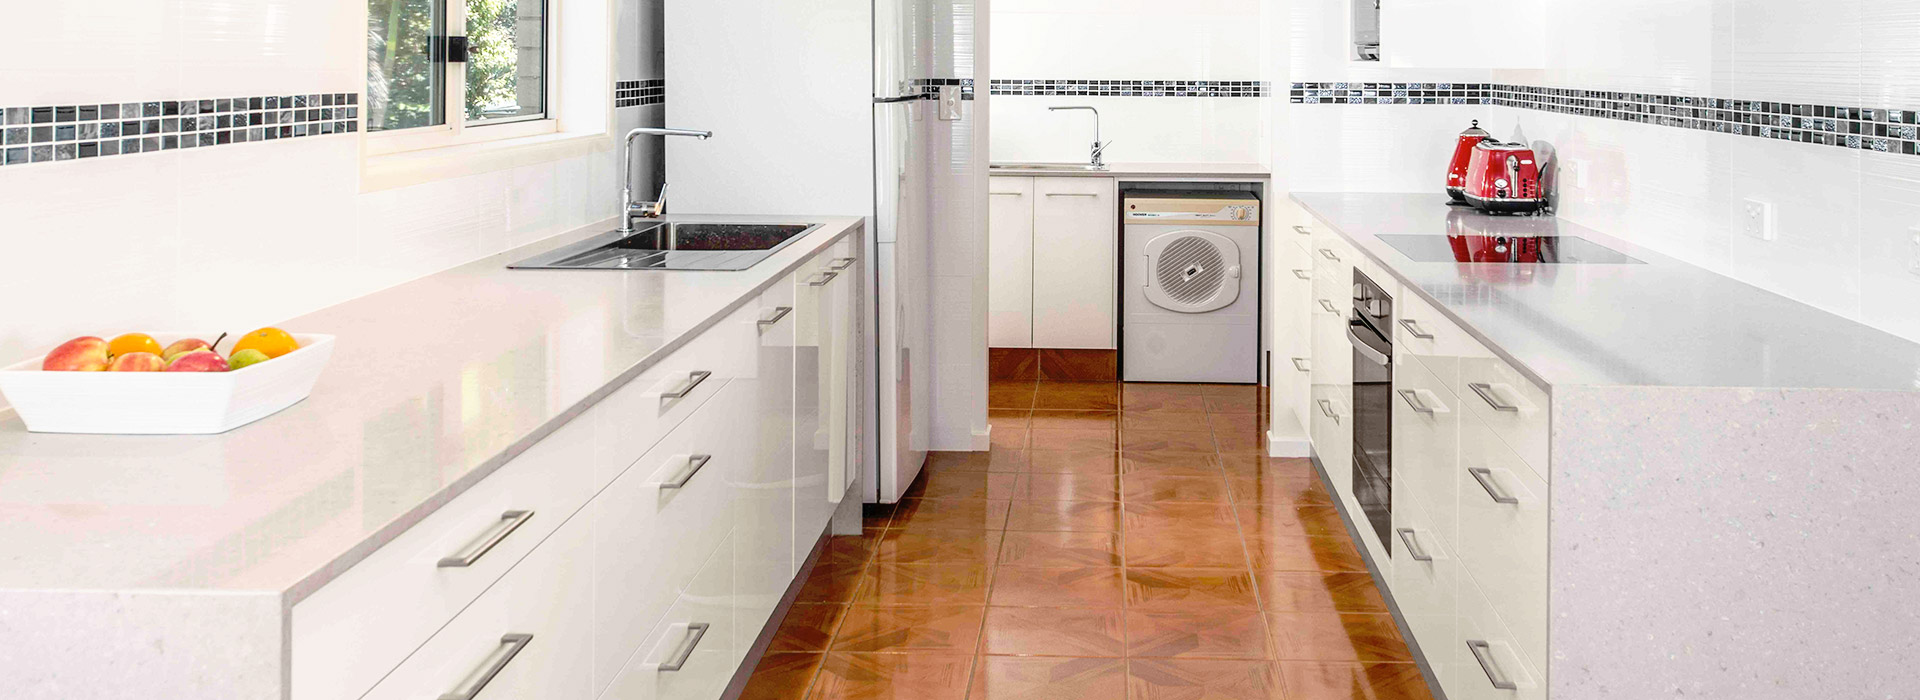 Kitchen Connection - white kitchen